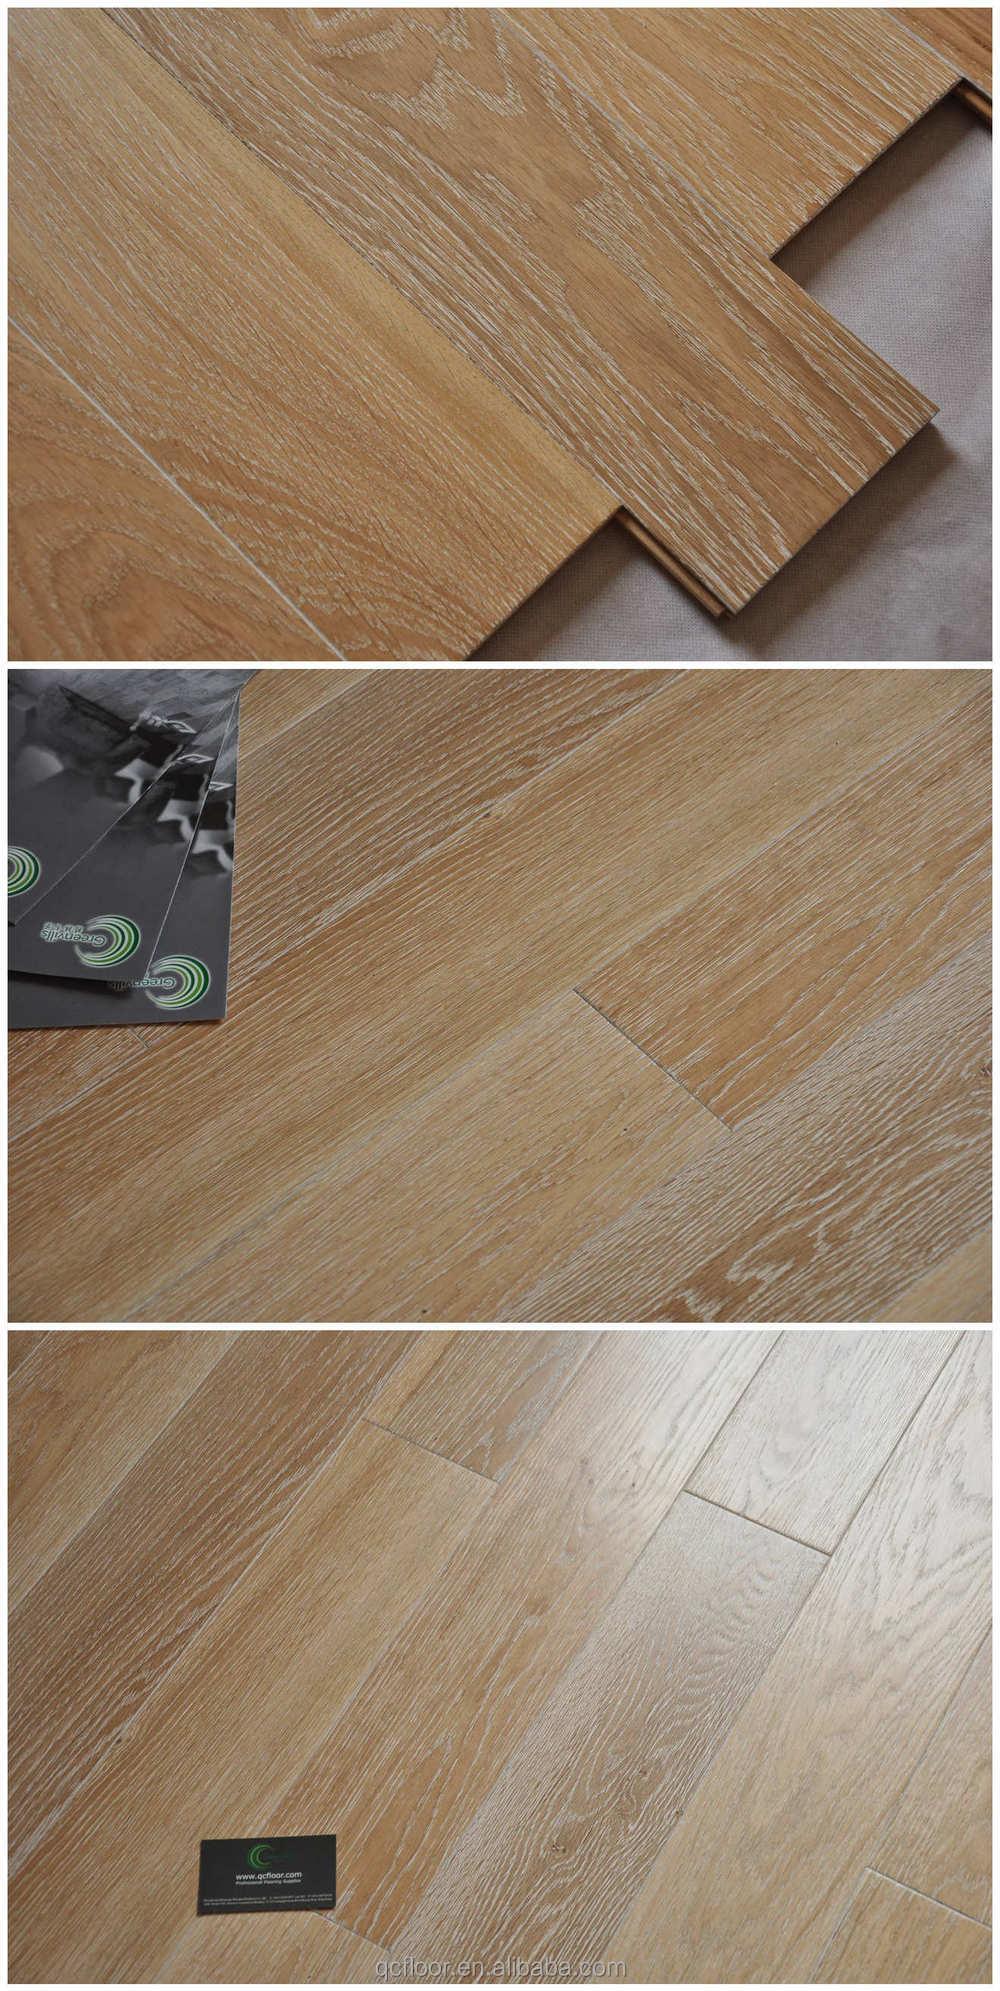 Oak solid wood hardwood flooring parquet buy oak solid for Buy unfinished hardwood flooring